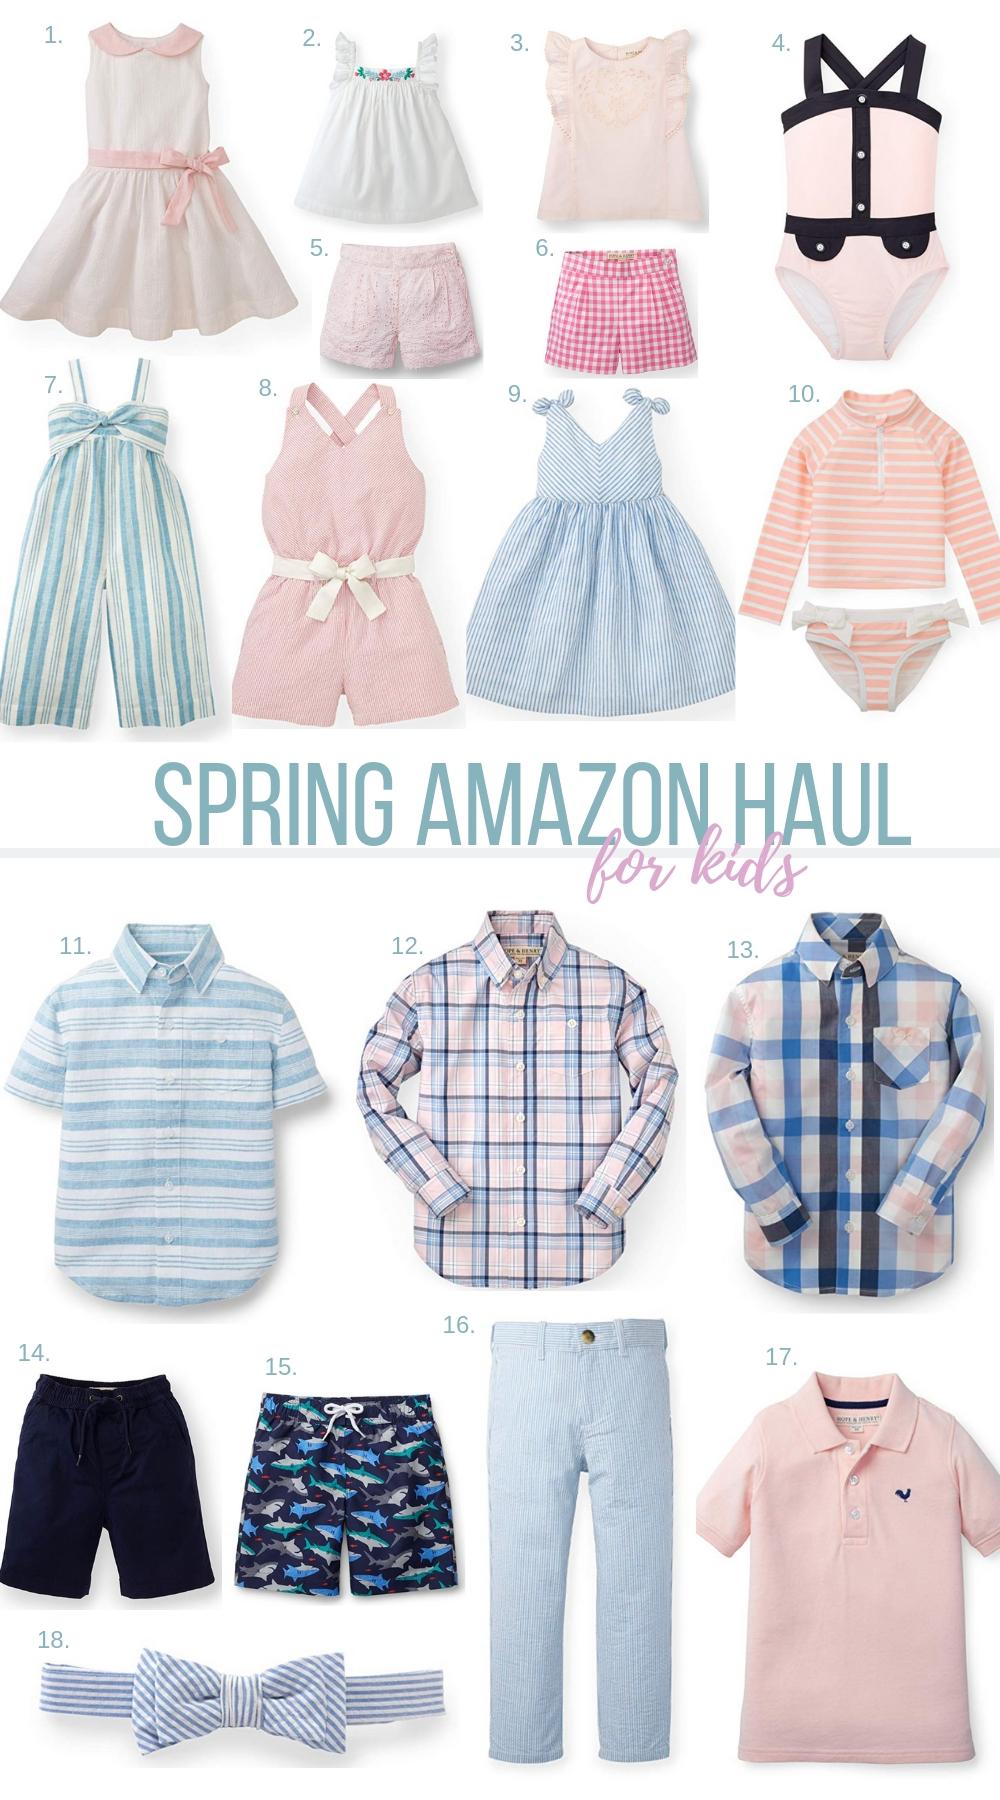 Amazon Fashion Haul for Kids | Spring 2019